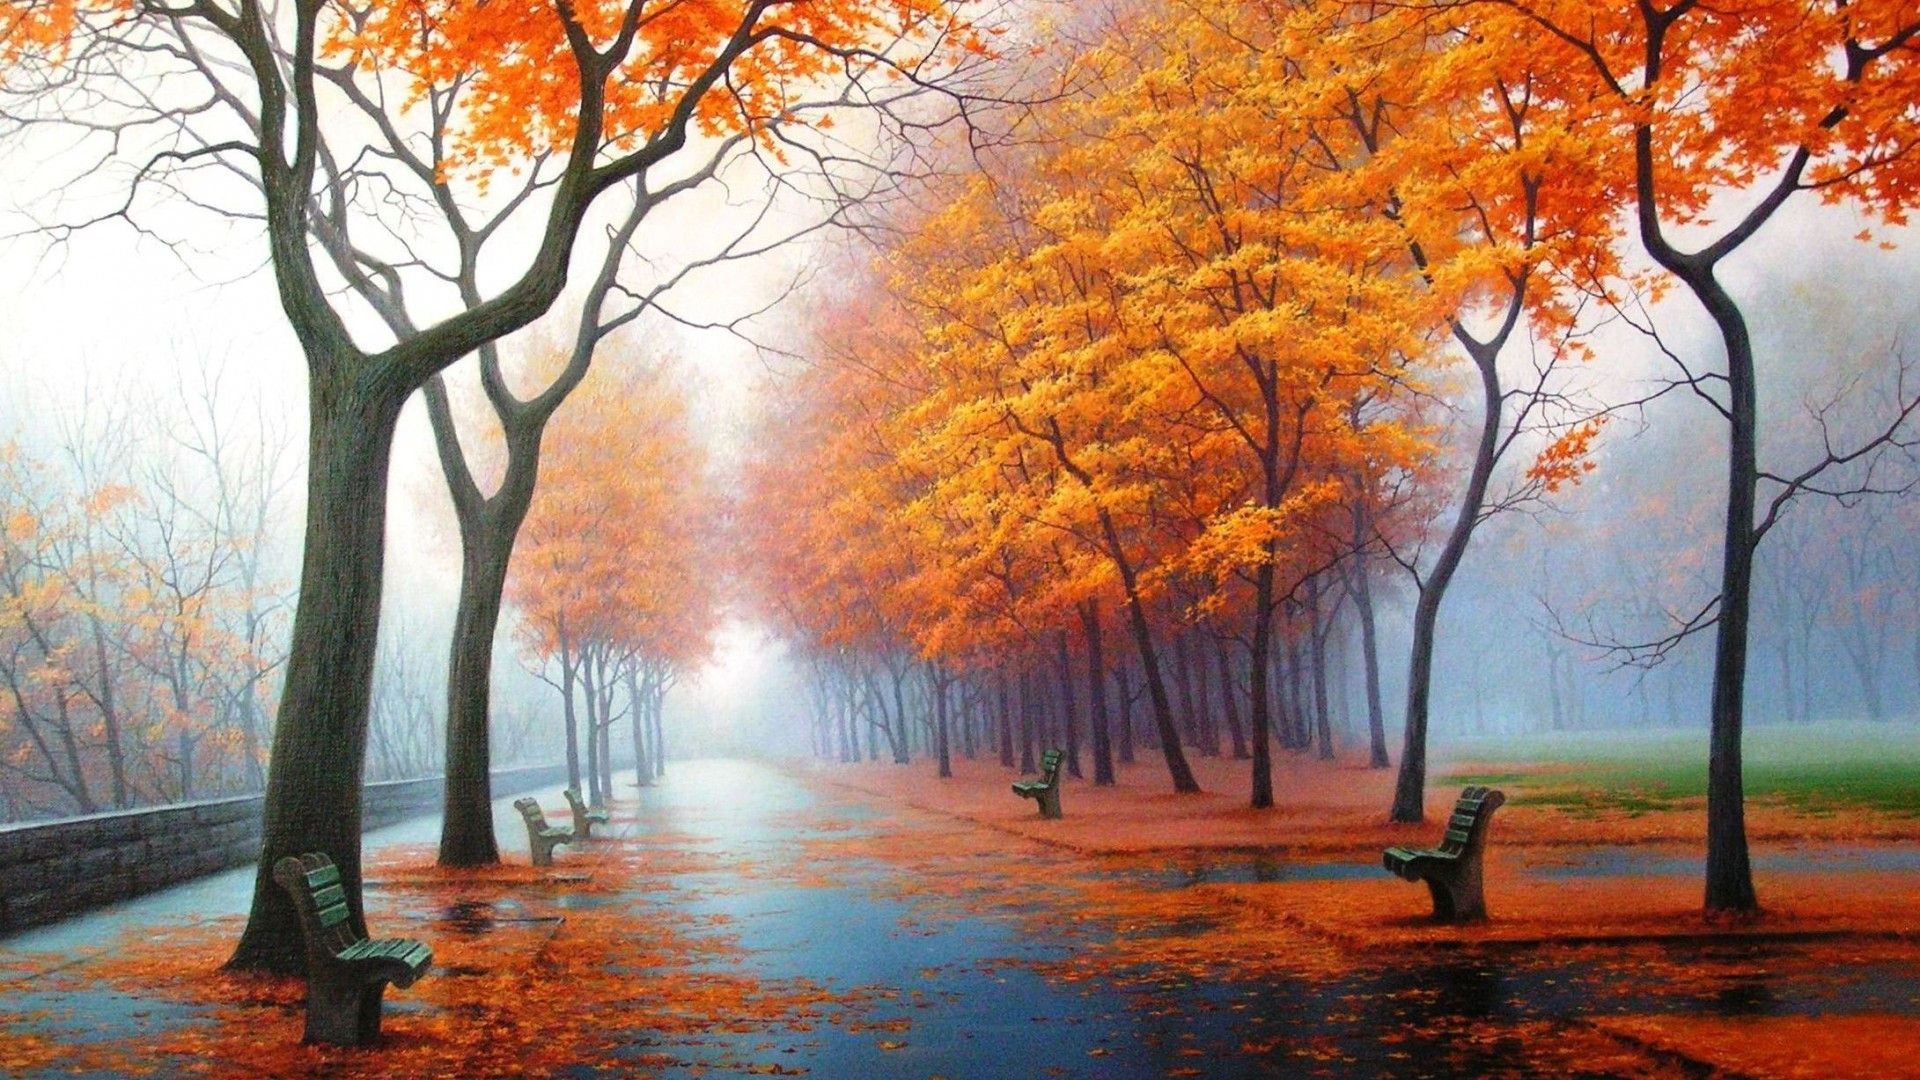 Pin By Roberta Scrivener On Haakuvaus Autumn Wallpaper Hd Nature Wallpaper Beautiful Wallpaper Hd